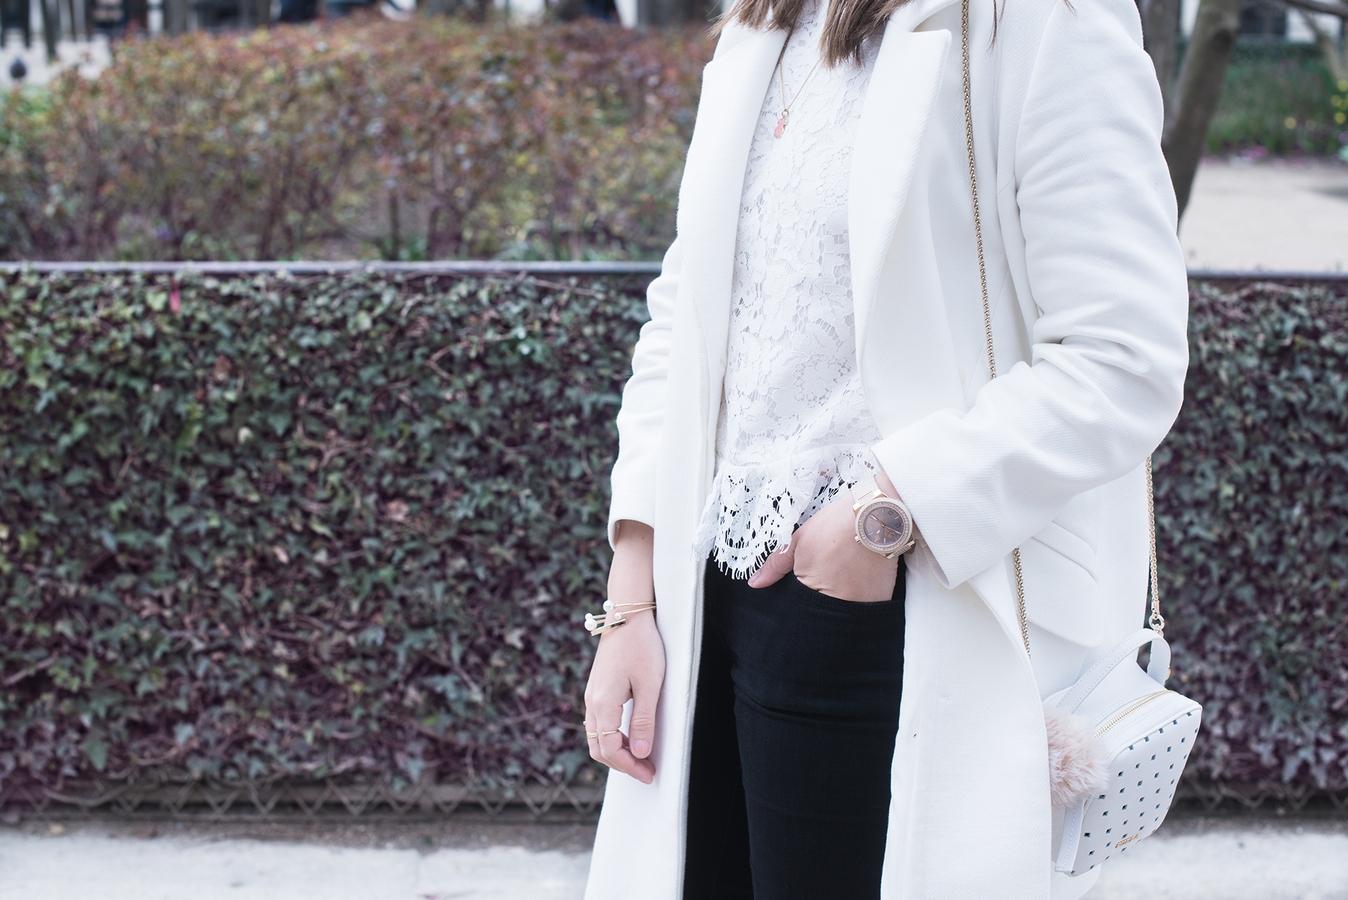 Blog mode femme Paris - Du style, Madame - streetstyle - top dentelle blanc